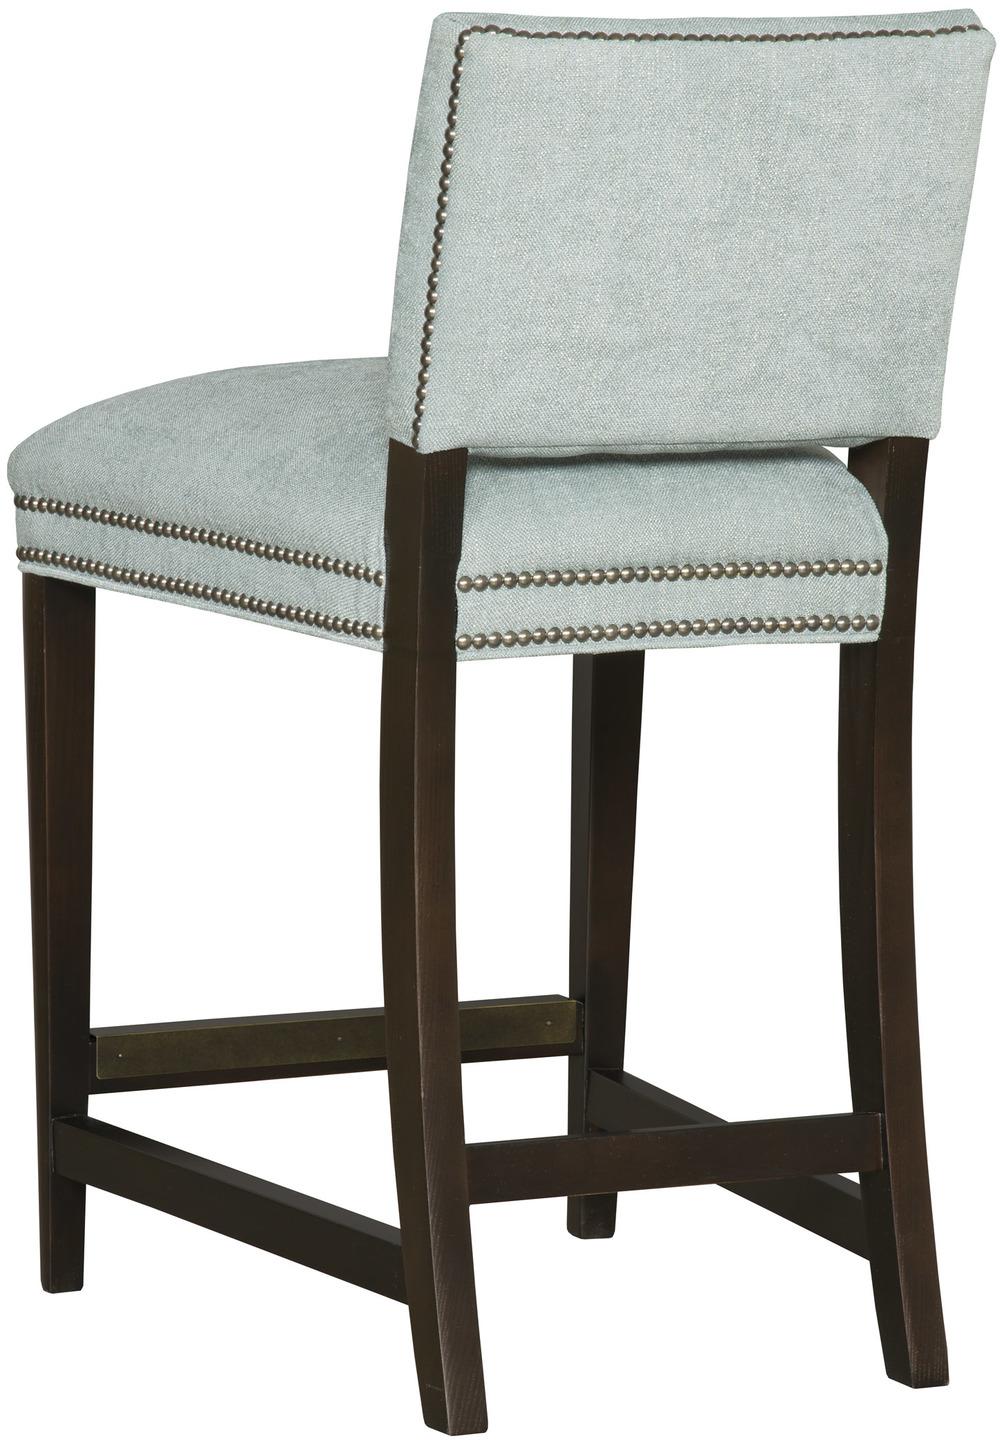 Vanguard Furniture - Newton Counter Stool